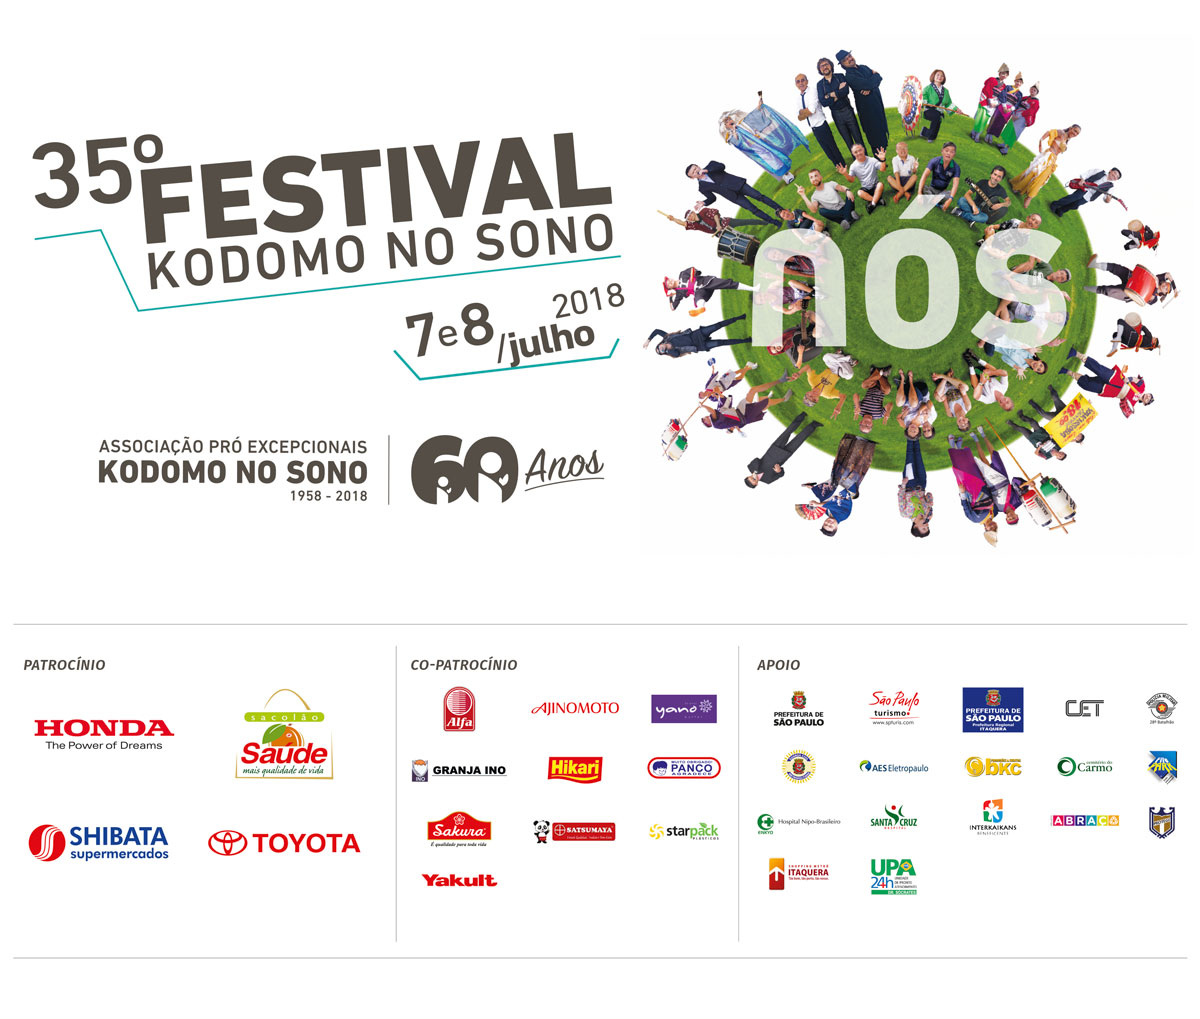 Agradecimento 35º Festival Kodomo no Sono